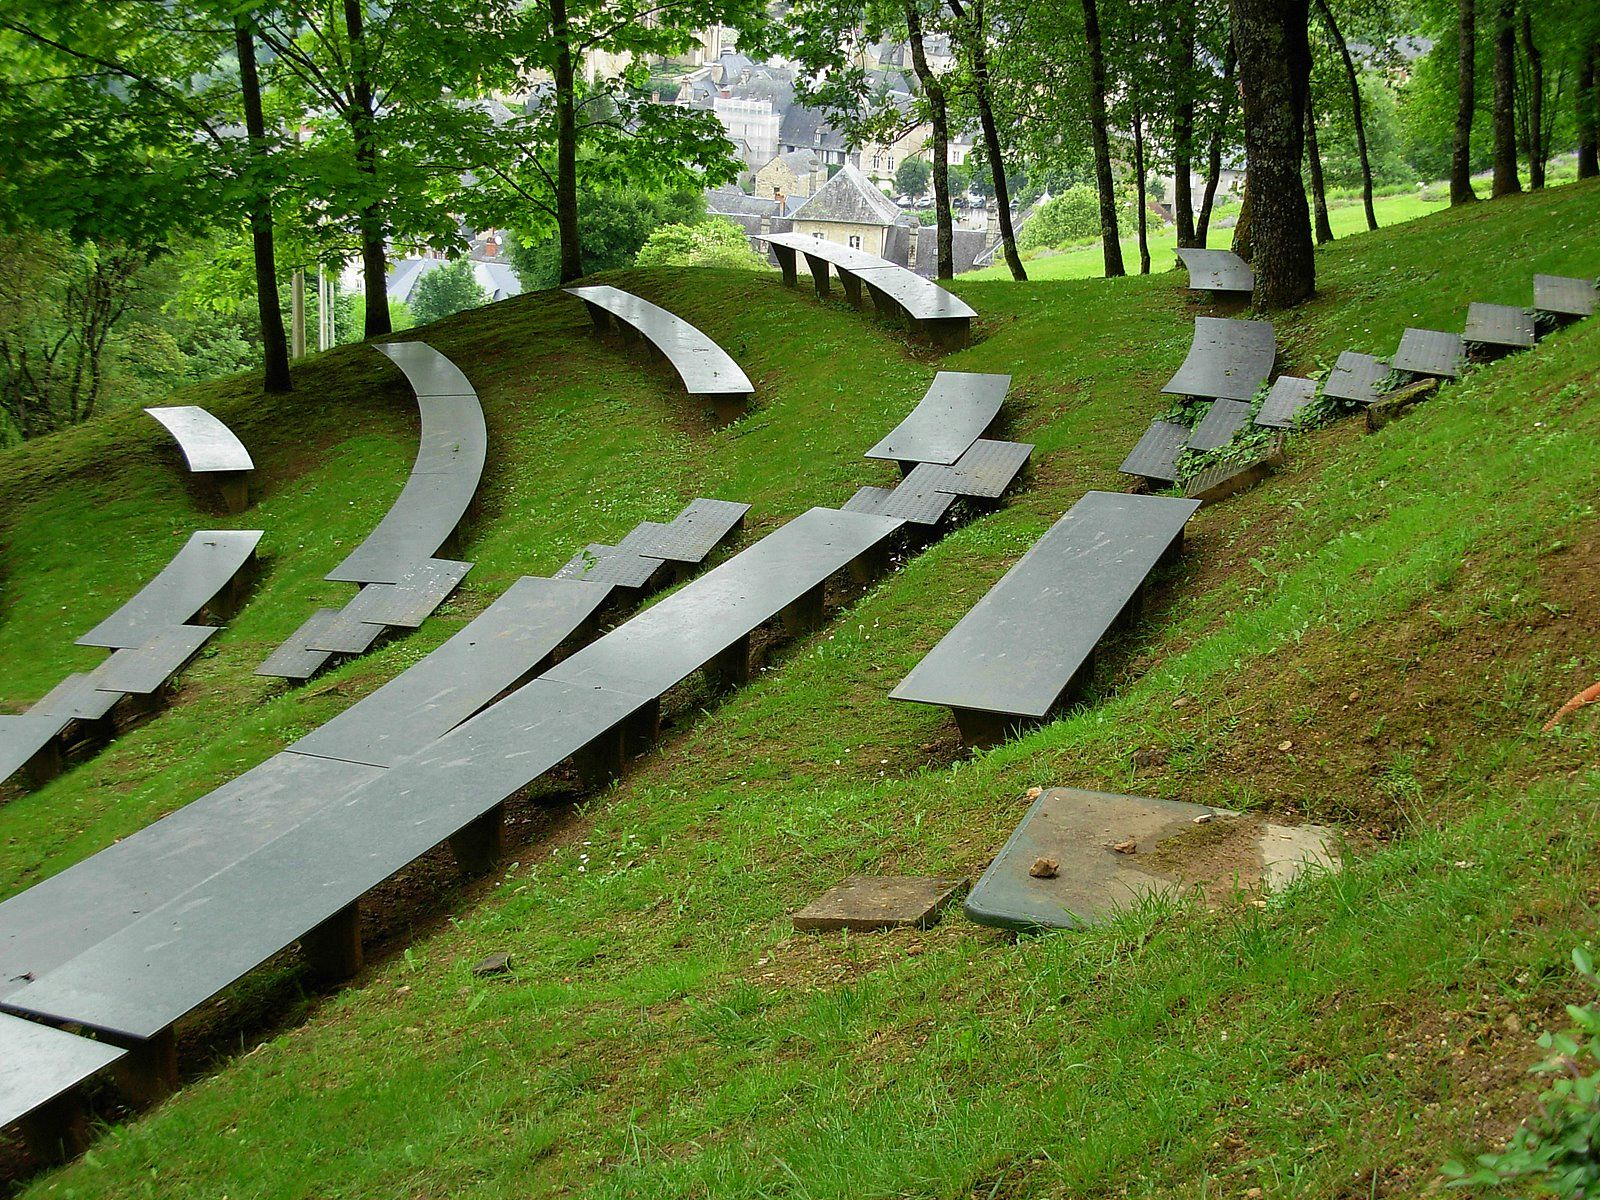 jardin public contemporain - Recherche Google | • L ...